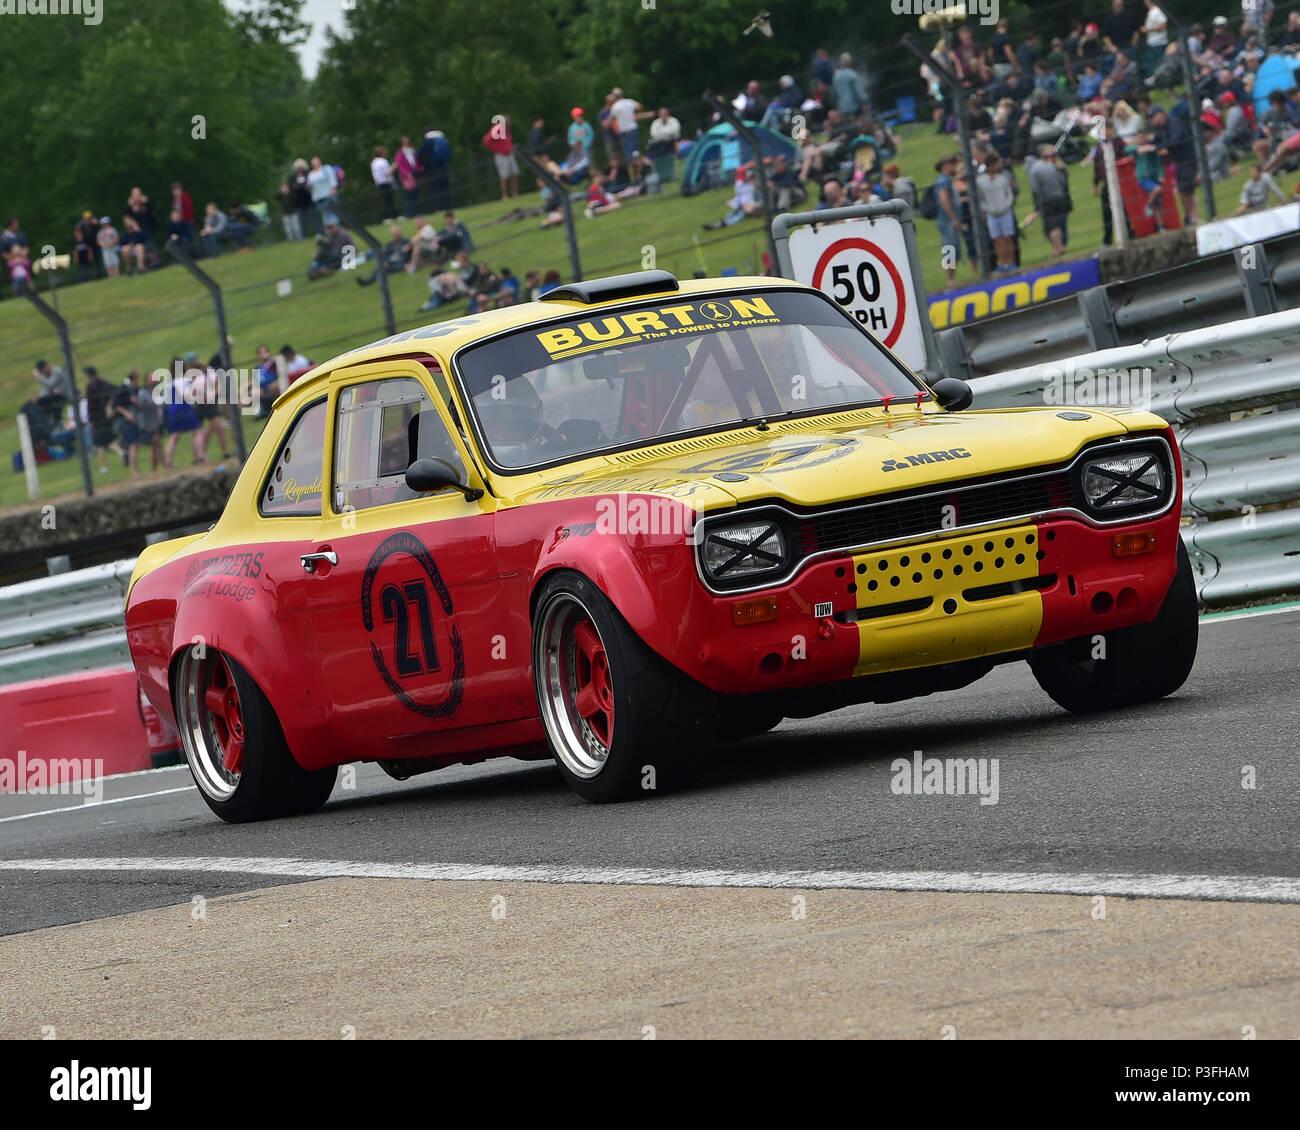 Martin Reynolds Ford Escort Mk 1 Bernie S V8s Us Muscle Cars